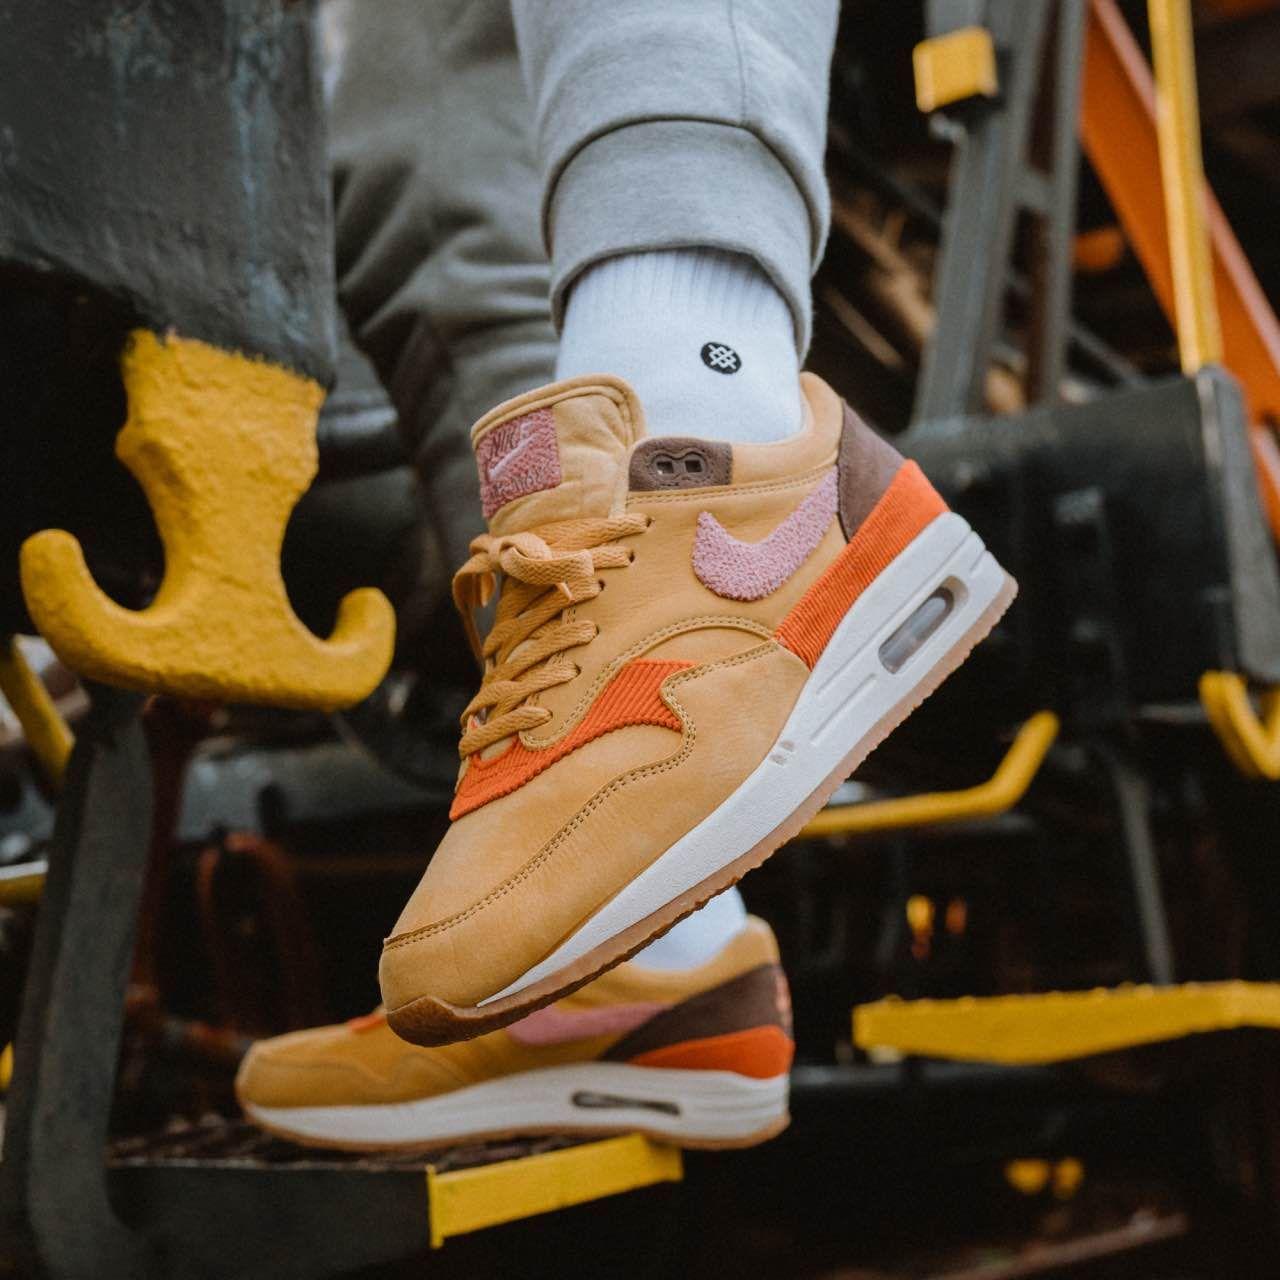 online retailer c31ff 69bf5 Nike Air Max 1 Gold   Pink   Brown isds.co sc CD7861-700 Credit   Solebox —   nike  airmax  sneakerhead  sneakersaddict  sneakers  kicks  footwear   shoes ...